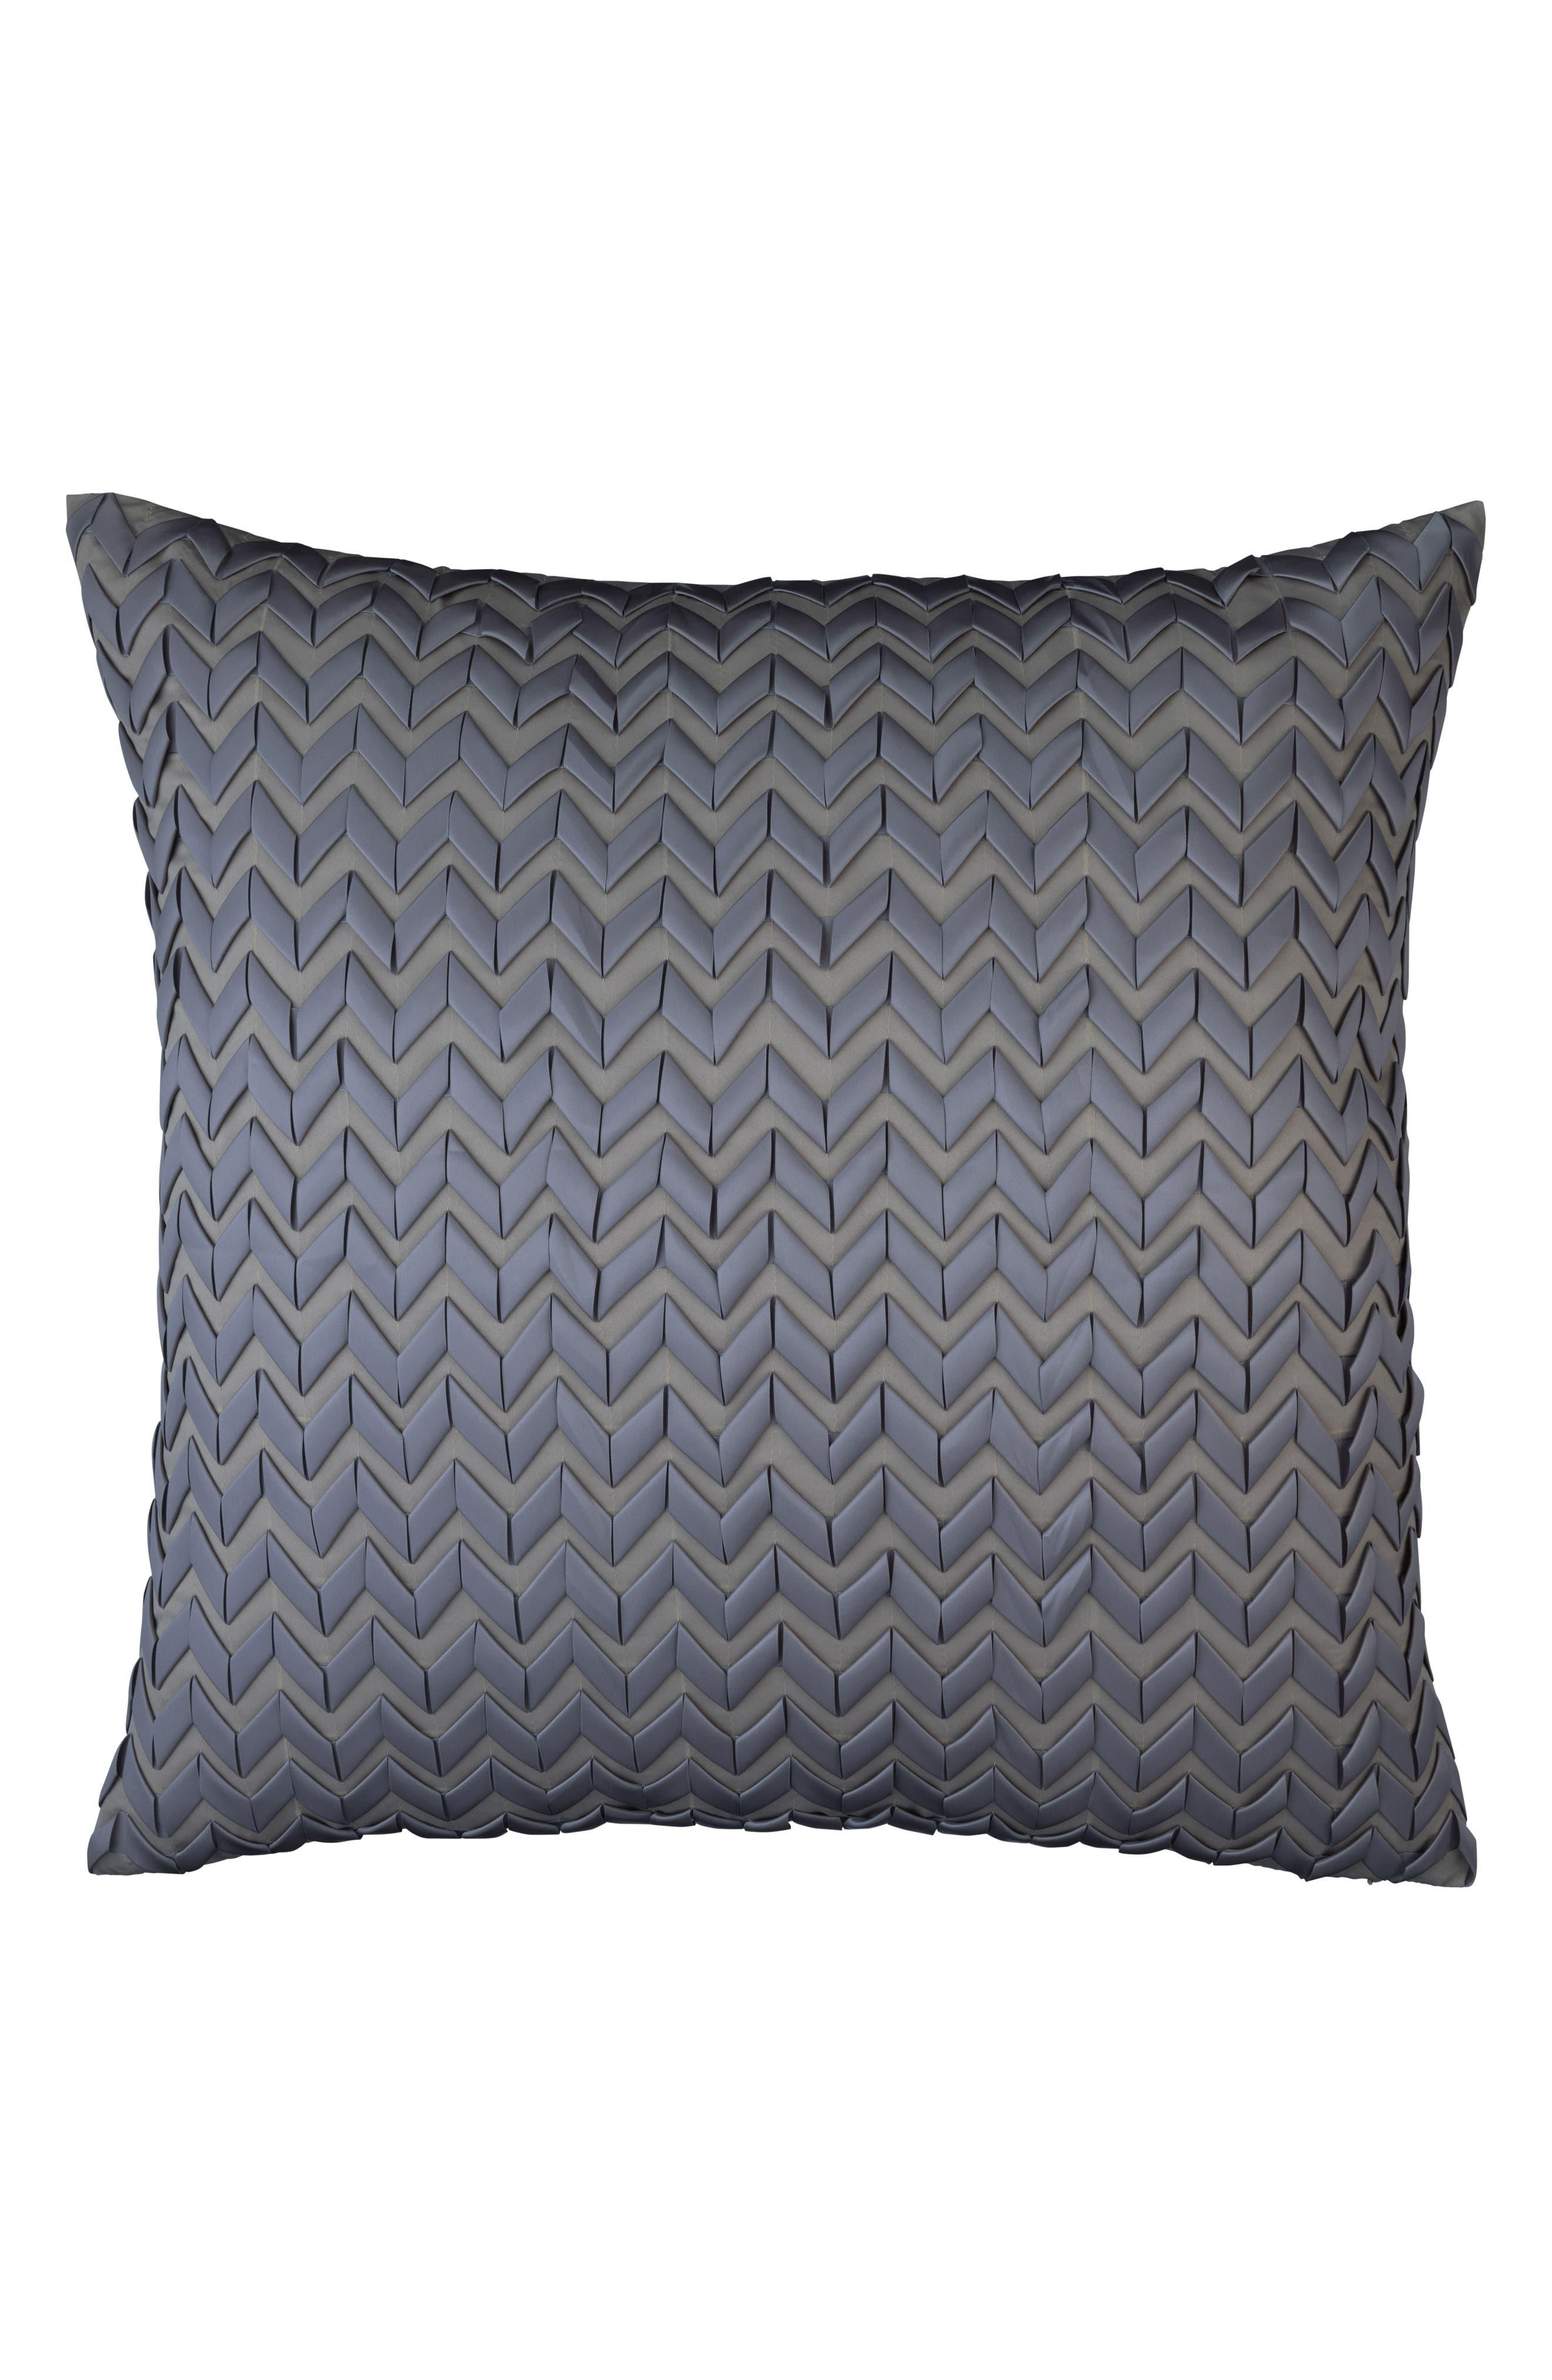 Ultra Ribbon Euro Accent Pillow,                             Main thumbnail 1, color,                             020